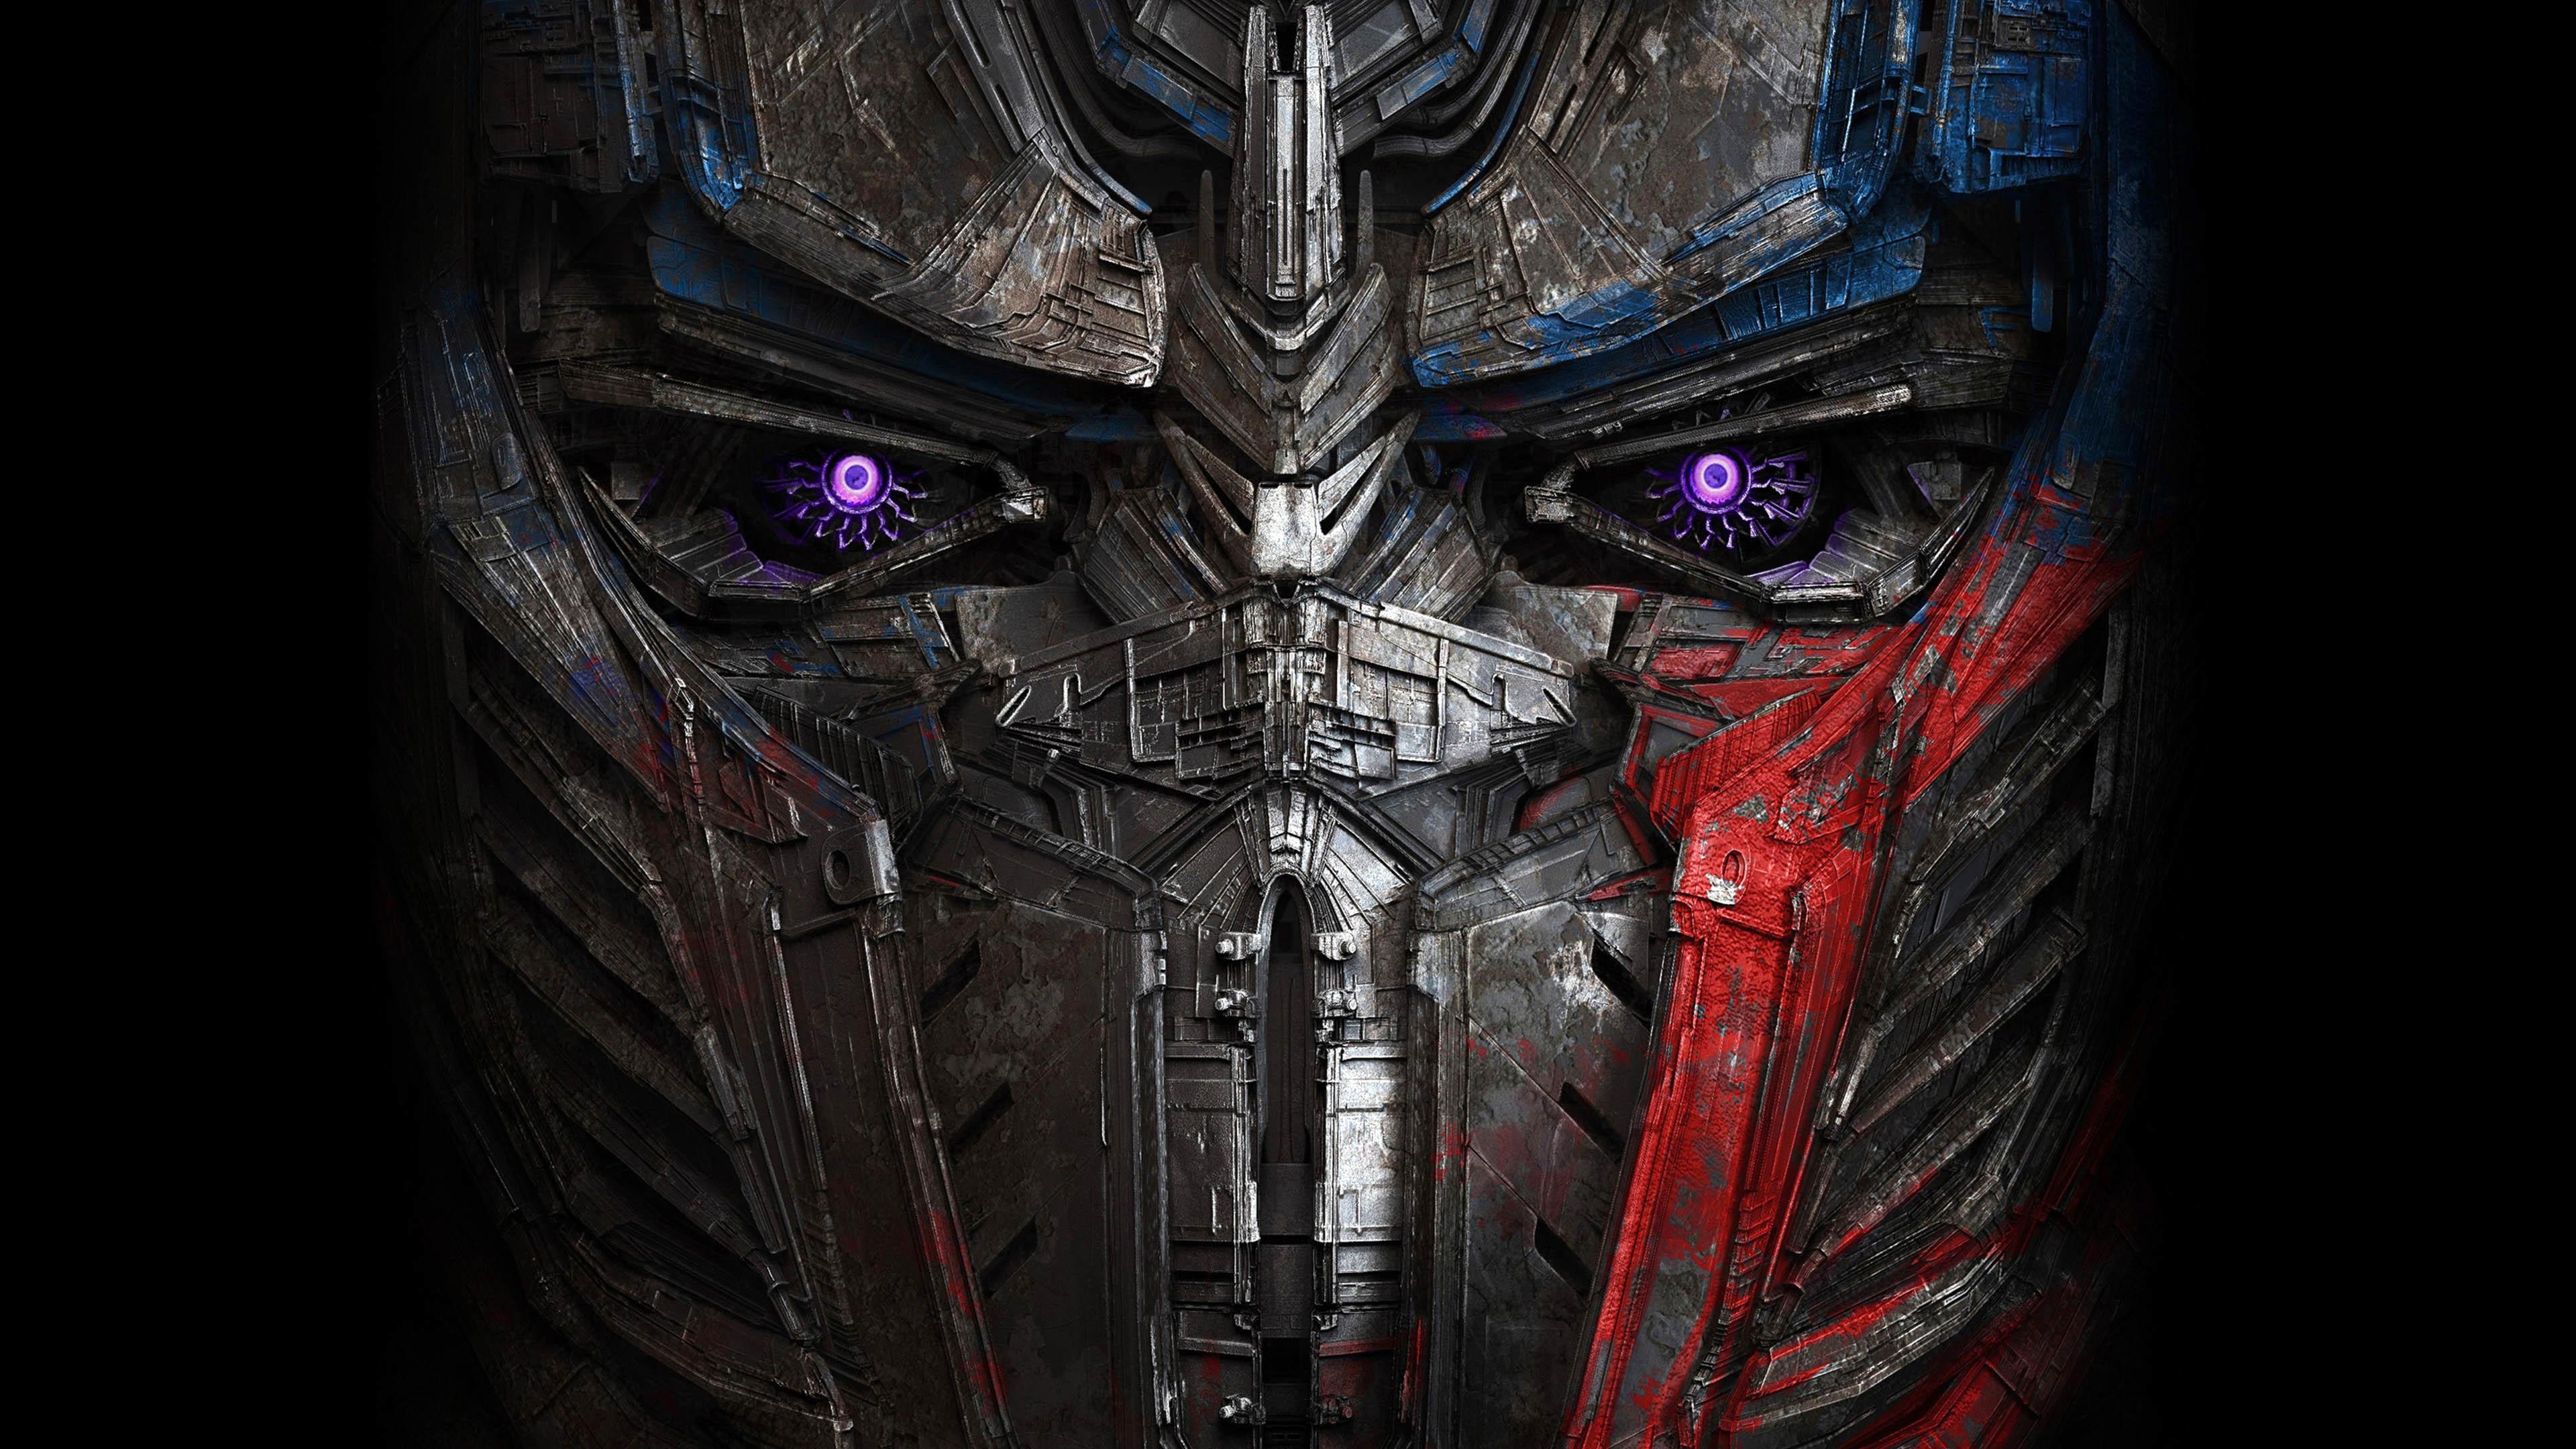 Transformers 5 The Last Knight 4K wallpaper